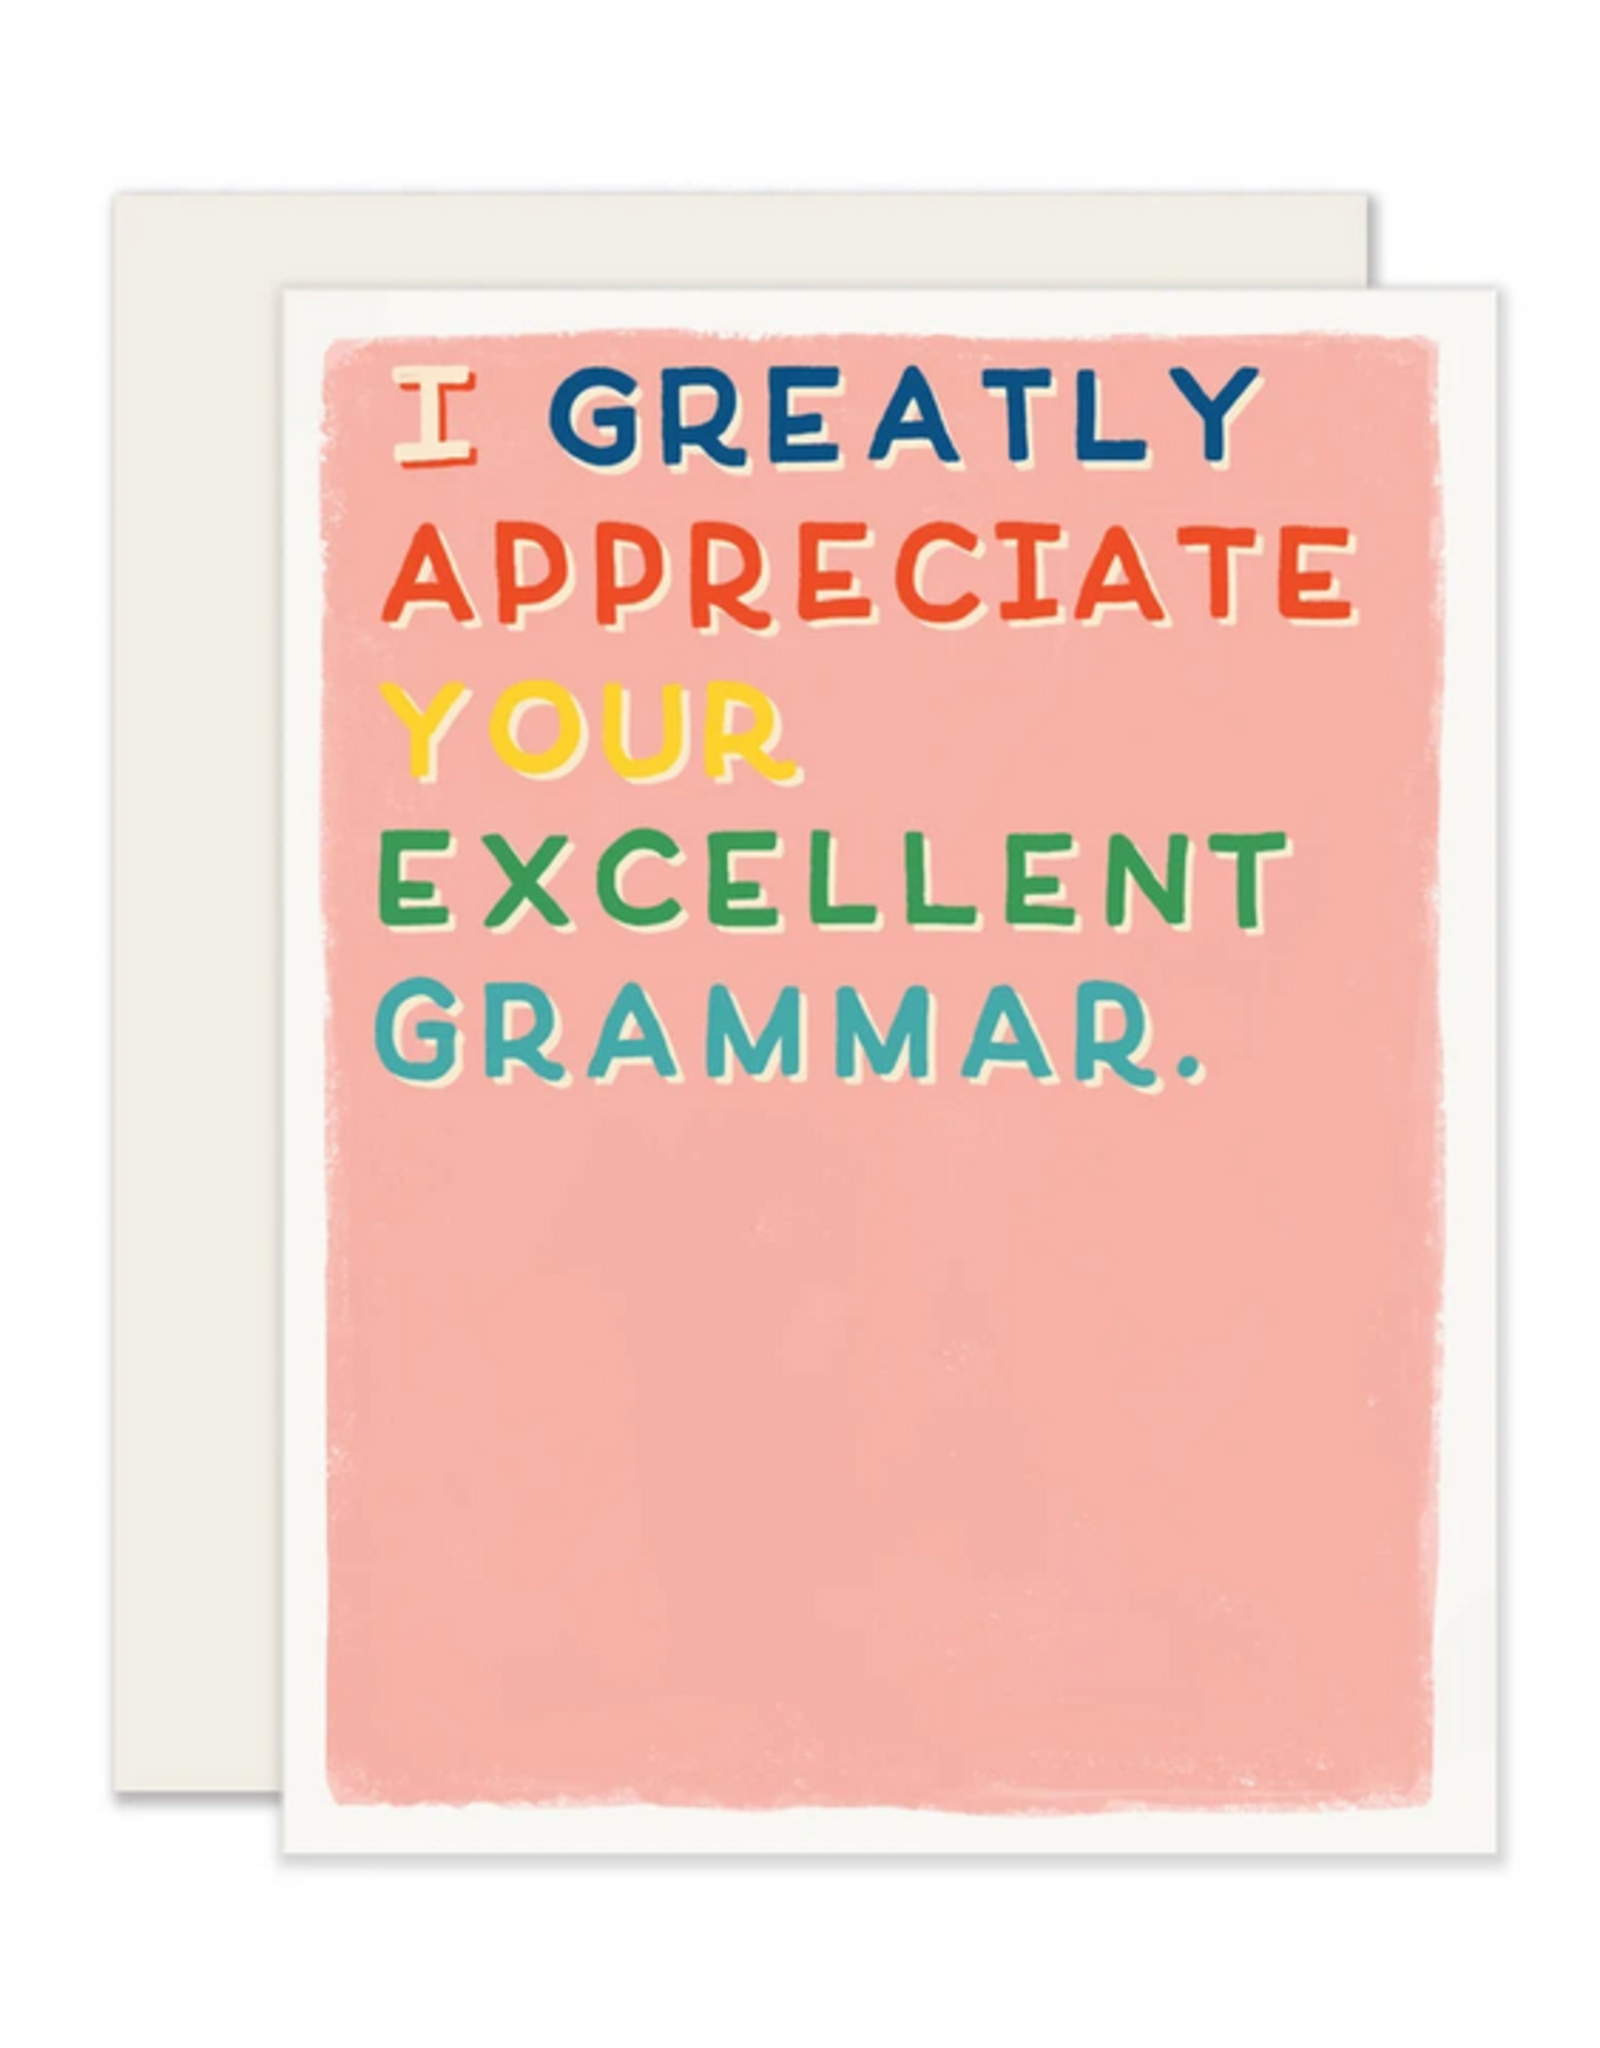 Excellent Grammar Card